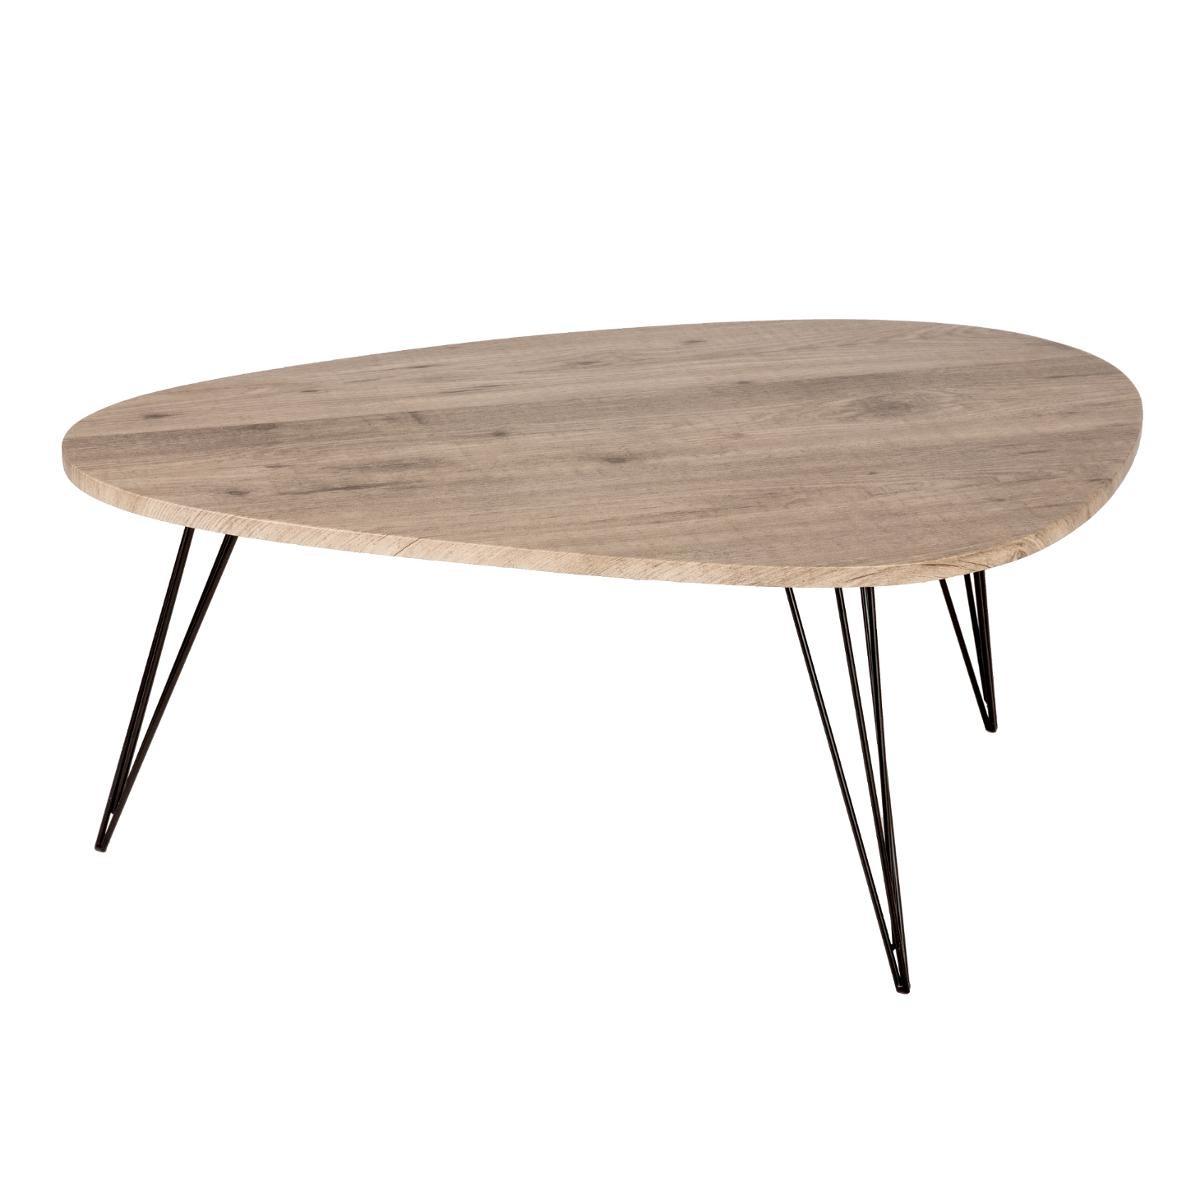 TABLE BASSE NEILE GRAND MODÈLE